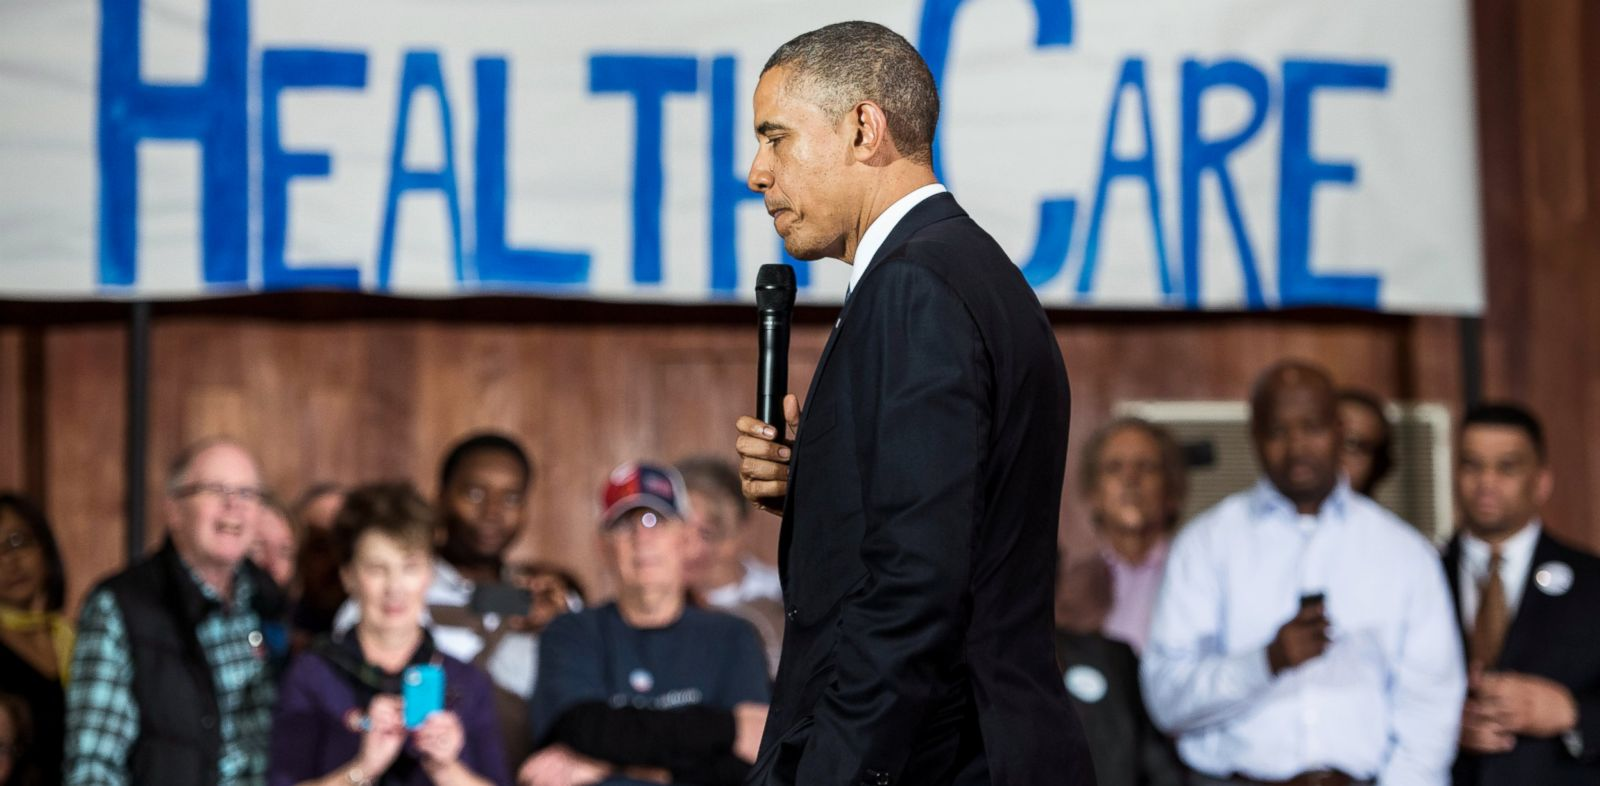 PHOTO: President Barack Obama pauses while speaking at Temple Emanu-El, Nov. 6, 2013, in Dallas.